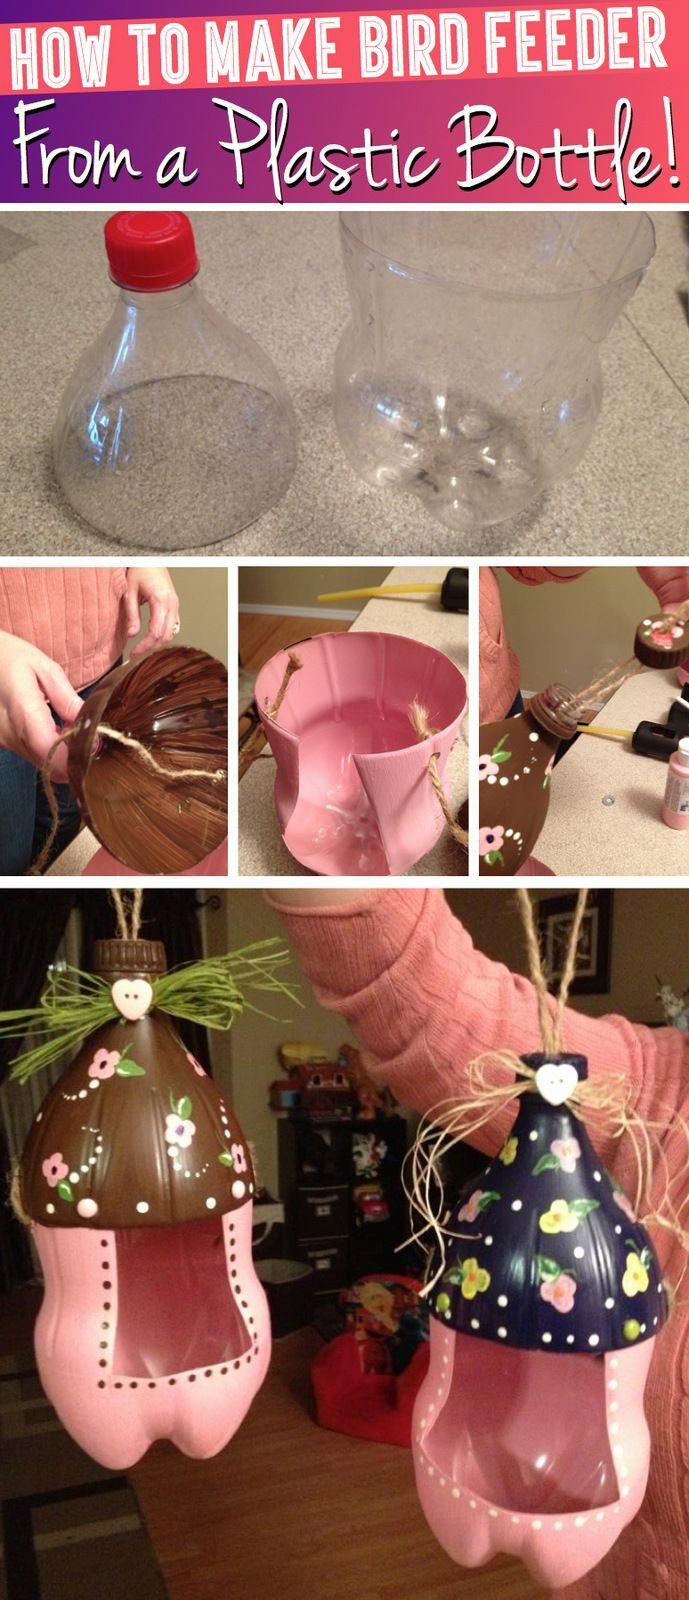 DIY bird feeders best ideas for bird lovers - Craftionary